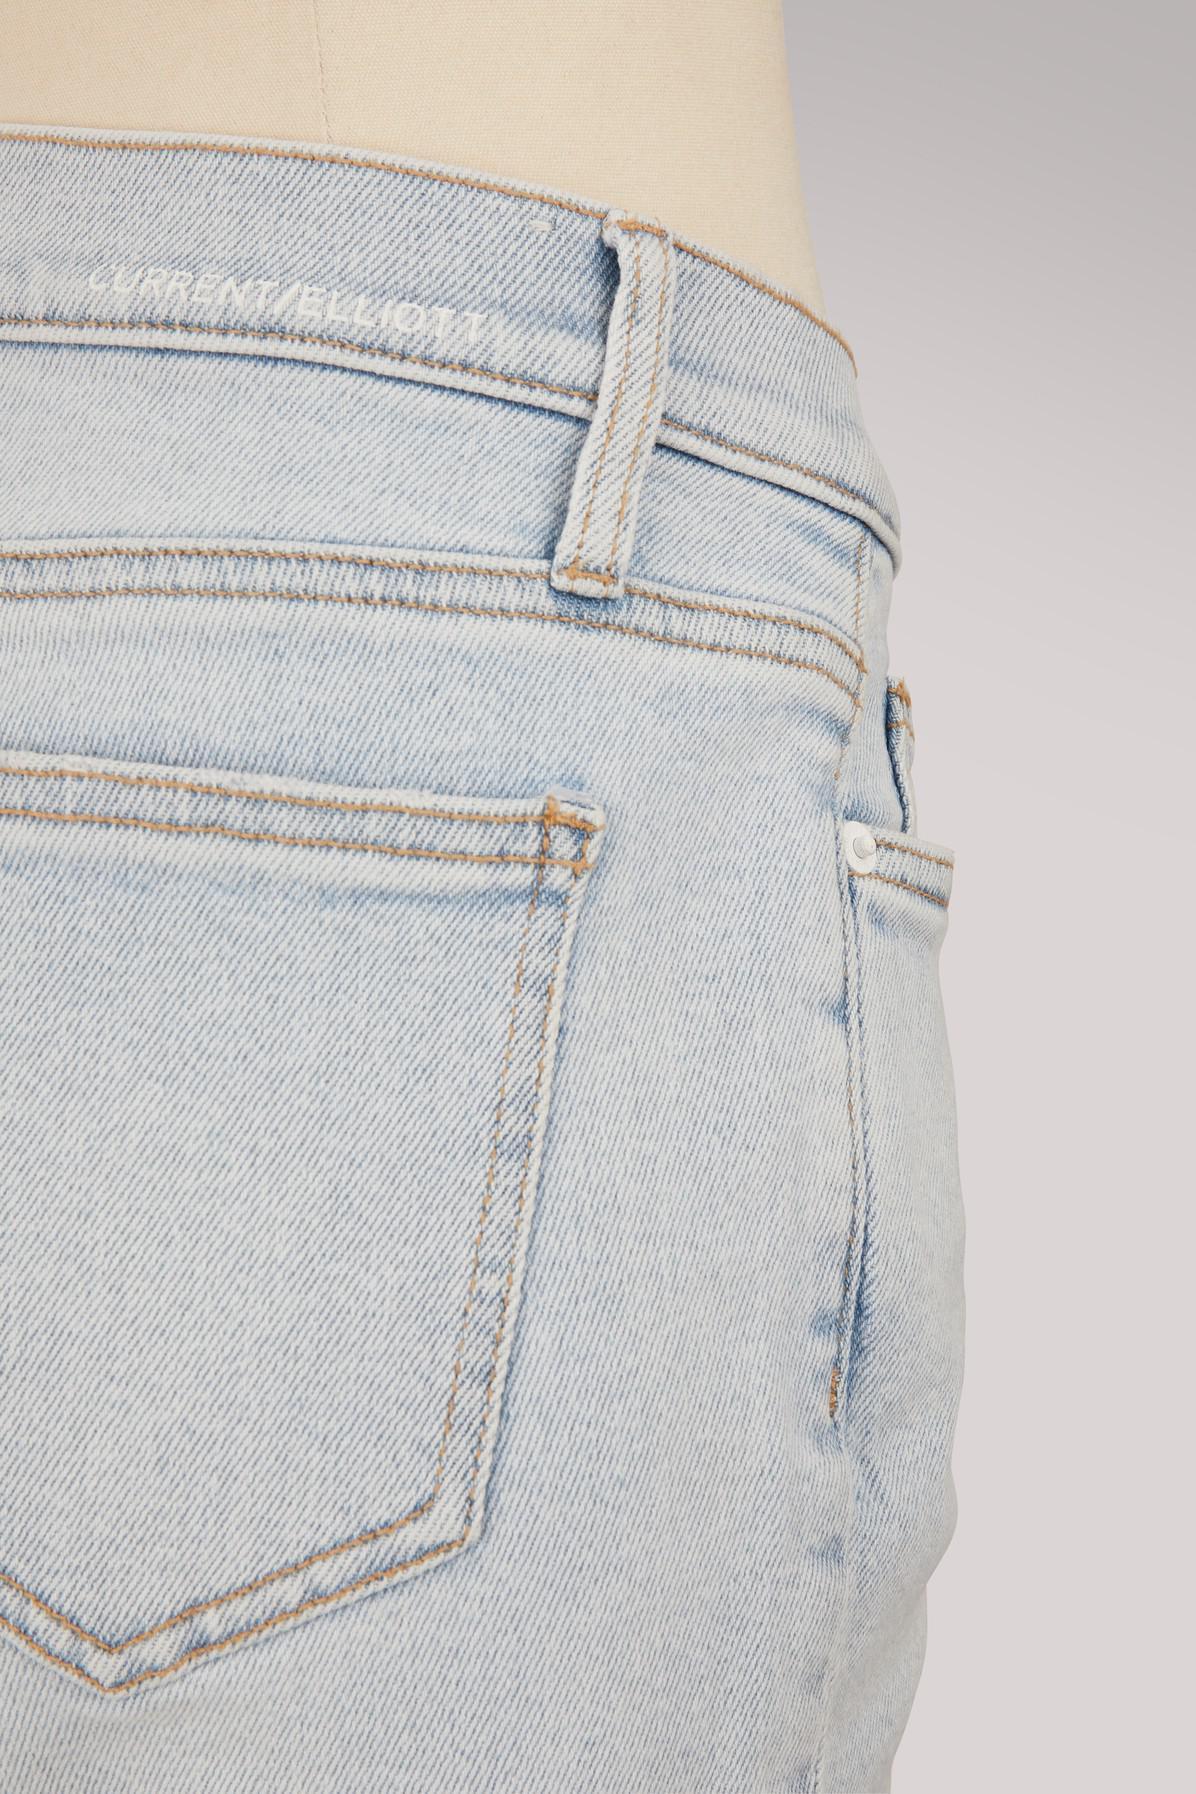 Current/Elliott Denim The Cropped Straight Jeans